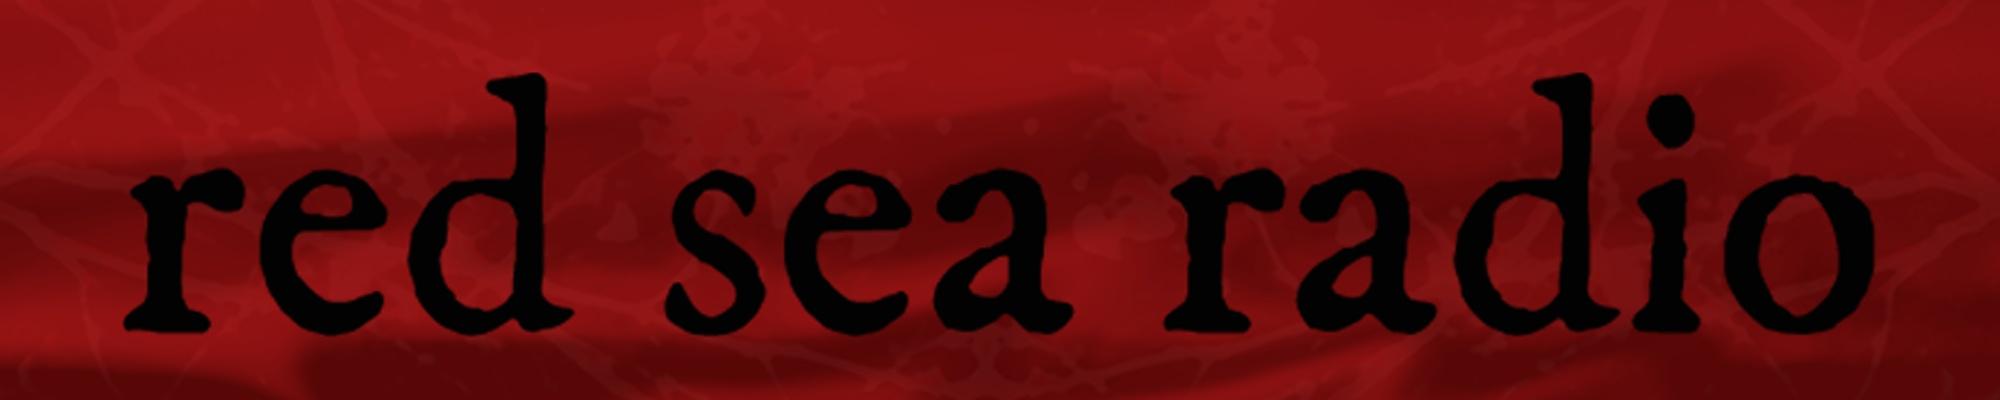 redsearadio Cover